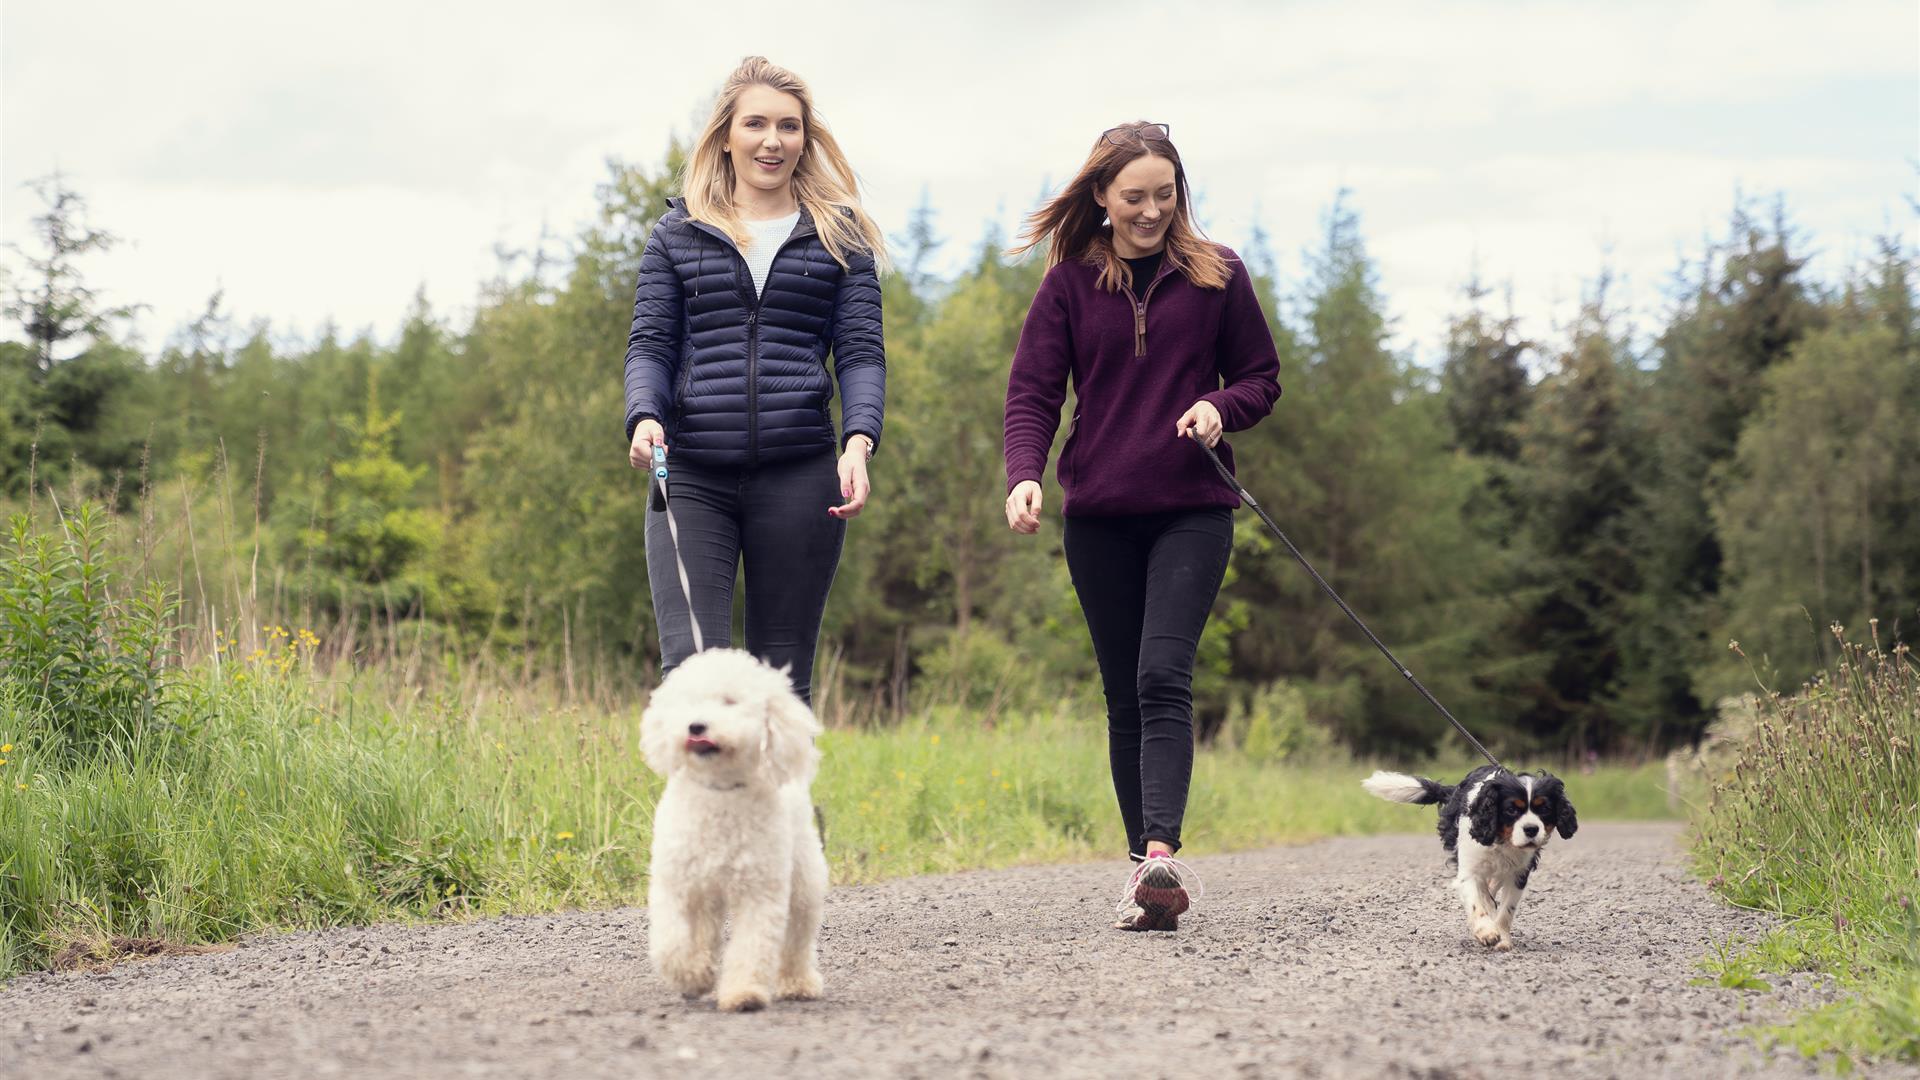 Garvagh Forest Walking Trails